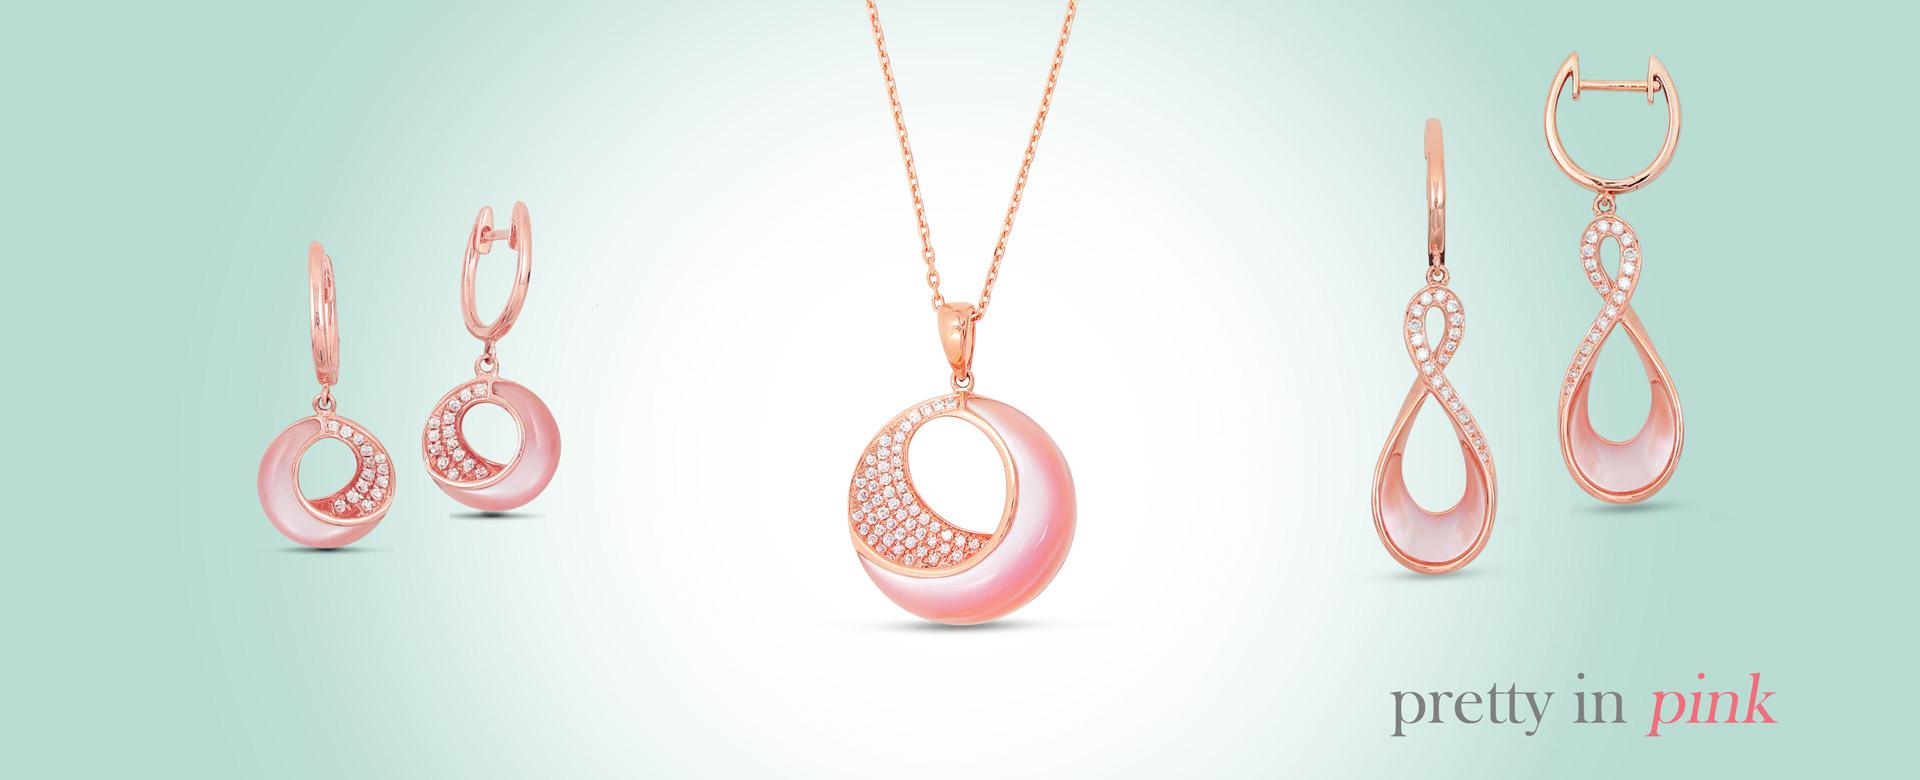 fine jewelry - pretty in pink